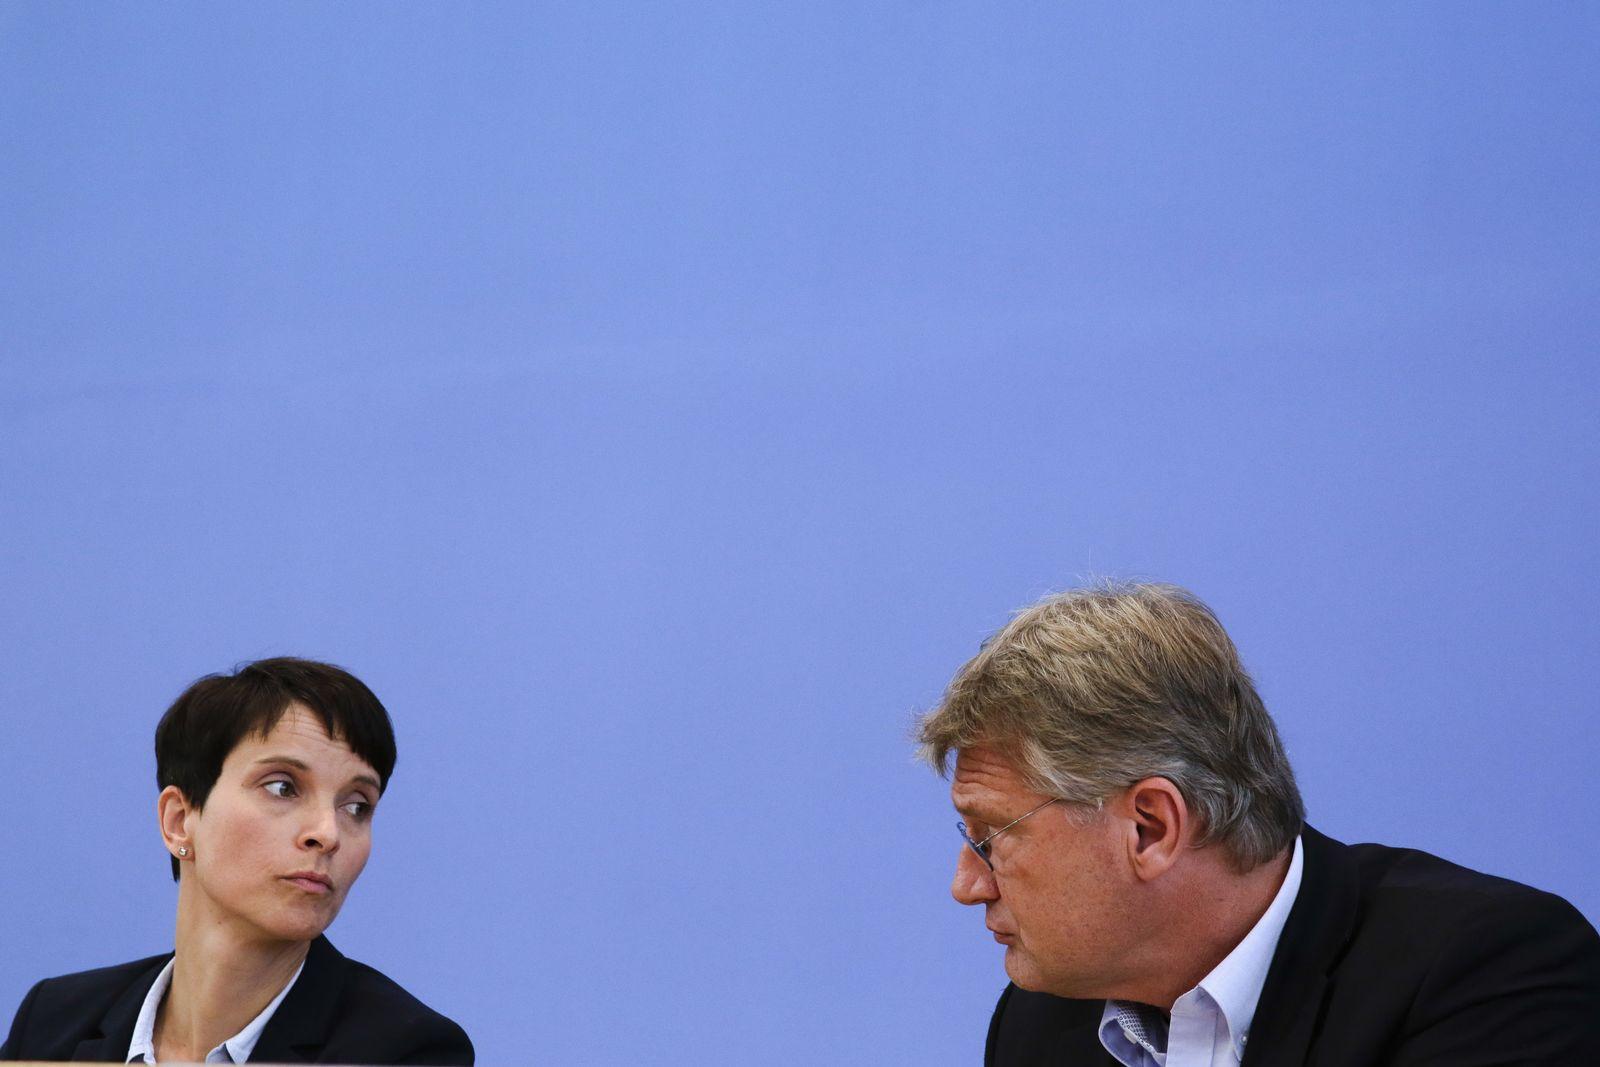 AfD / Frauke Petry / Joerg Meuthen